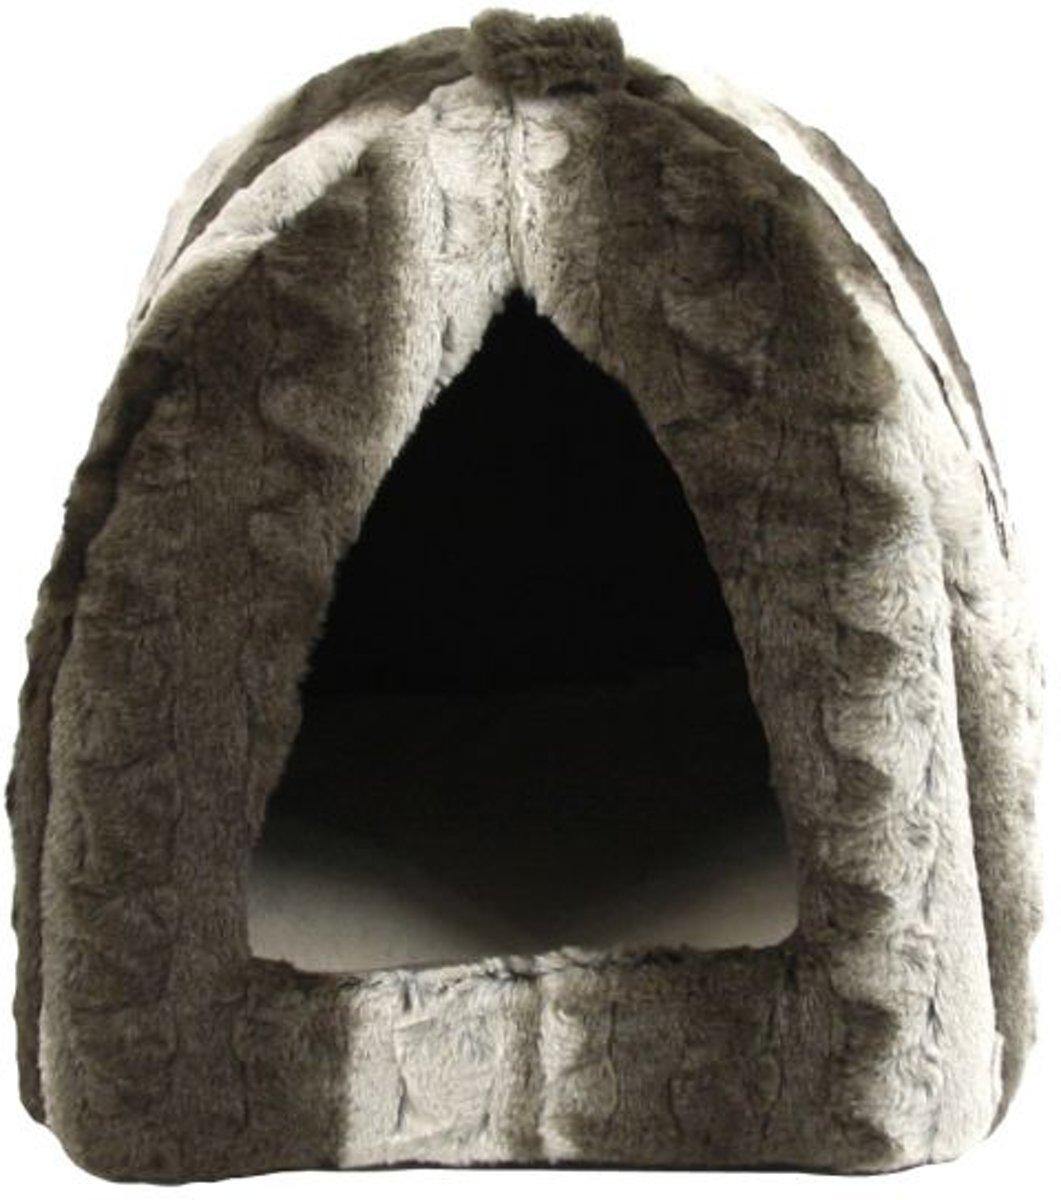 Rosewood 40 Winks Iglo Snuggle - Kattenmand - Grijs / Creme - 40x40x35 cm